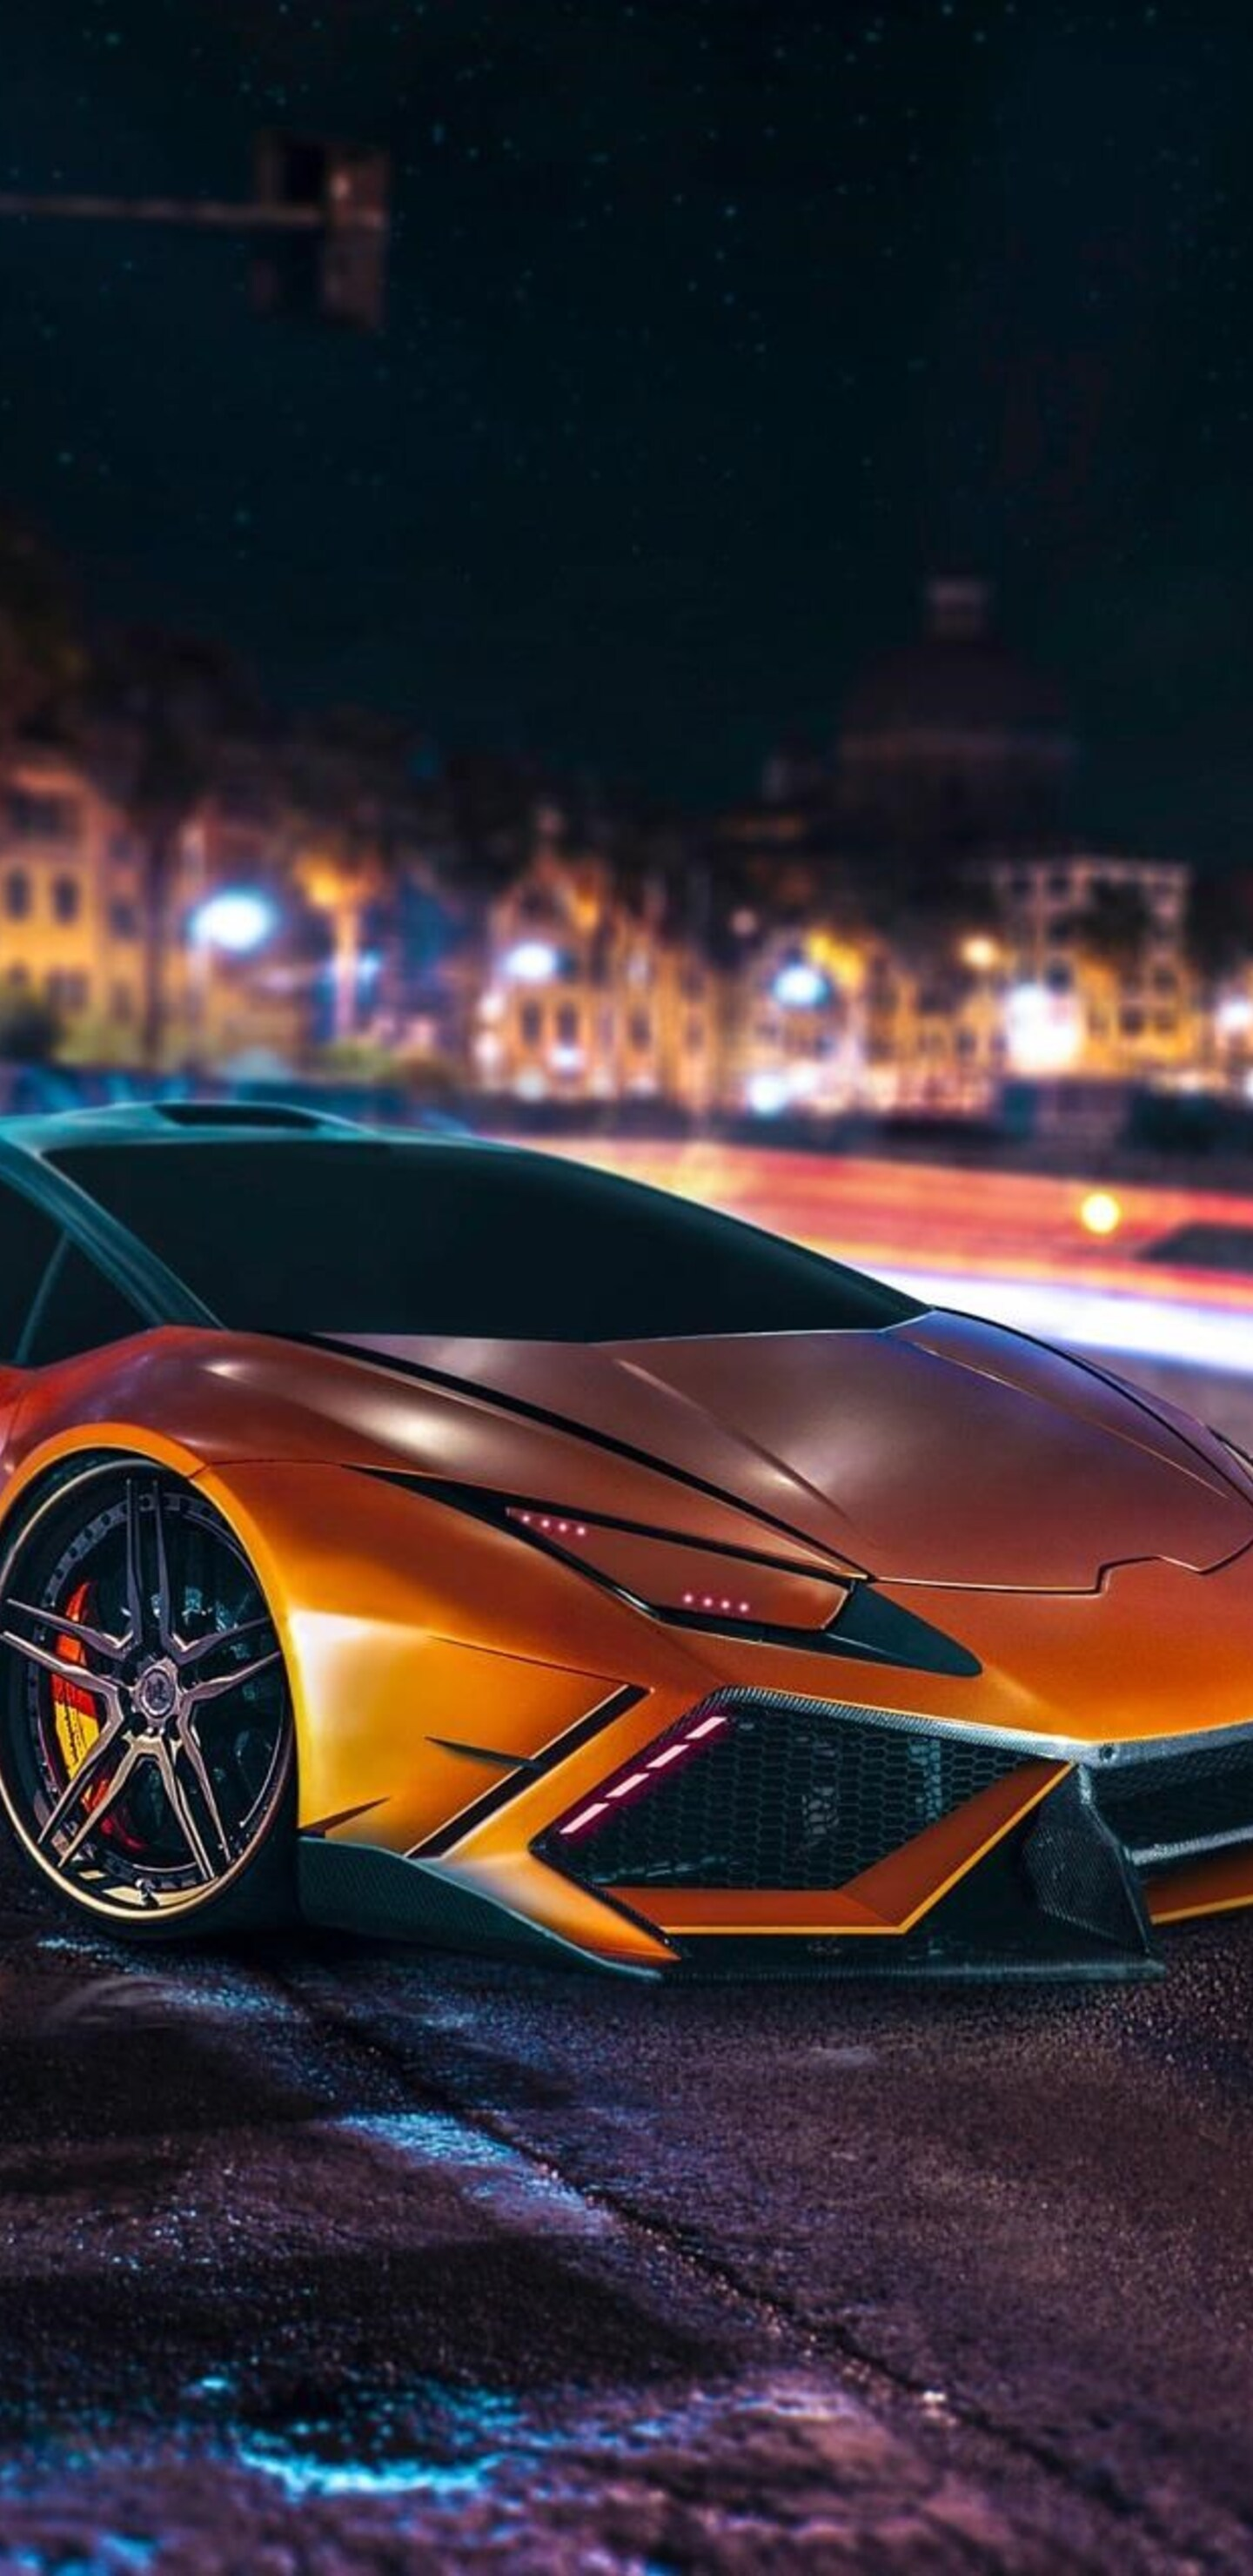 1440x2960 Lamborghini Huracan Full Hd Samsung Galaxy Note 9 8 S9 S8